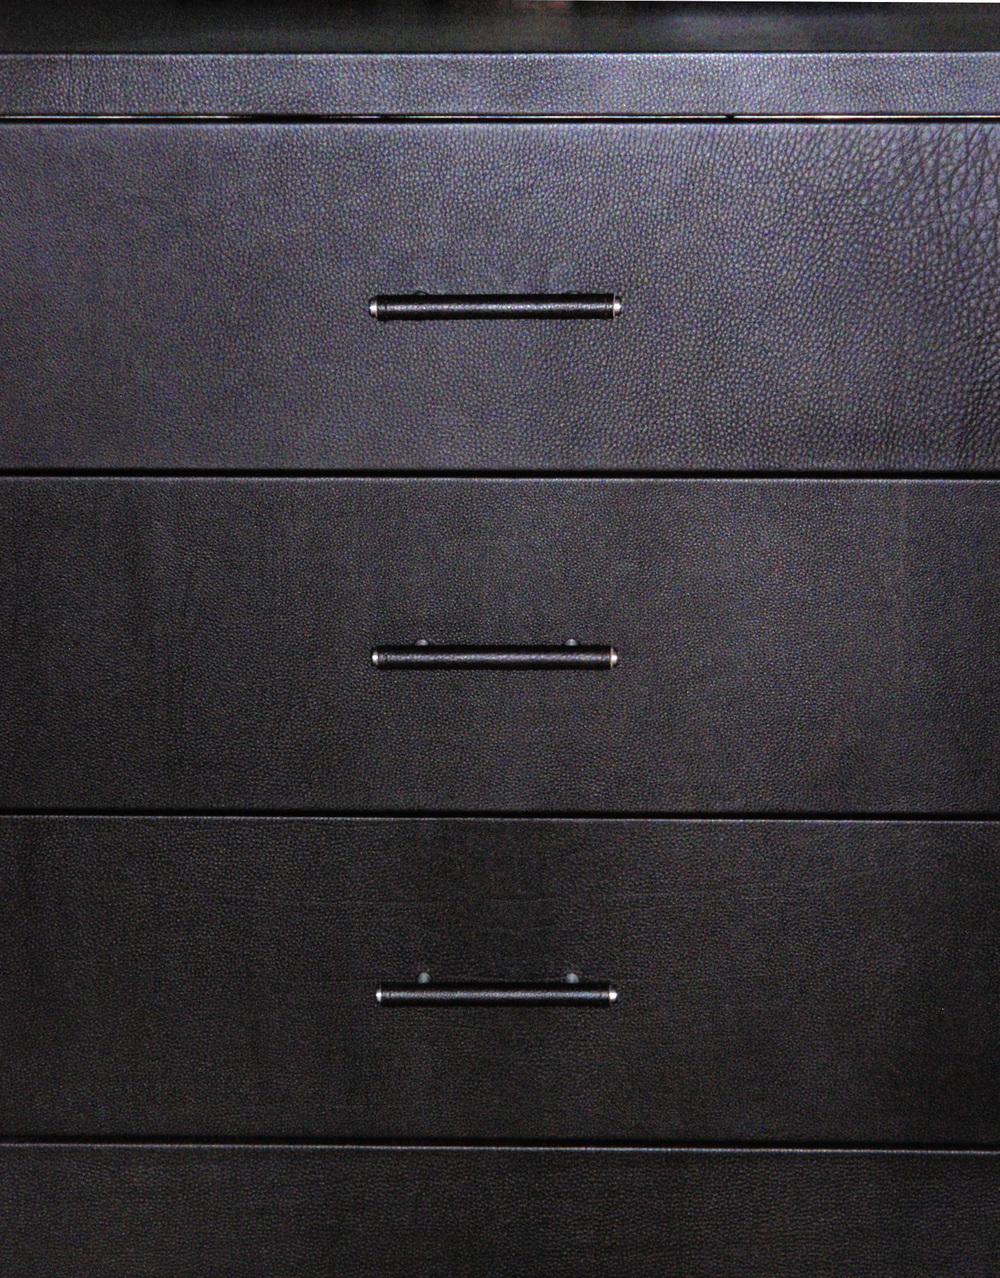 Dressing Closet Drawers